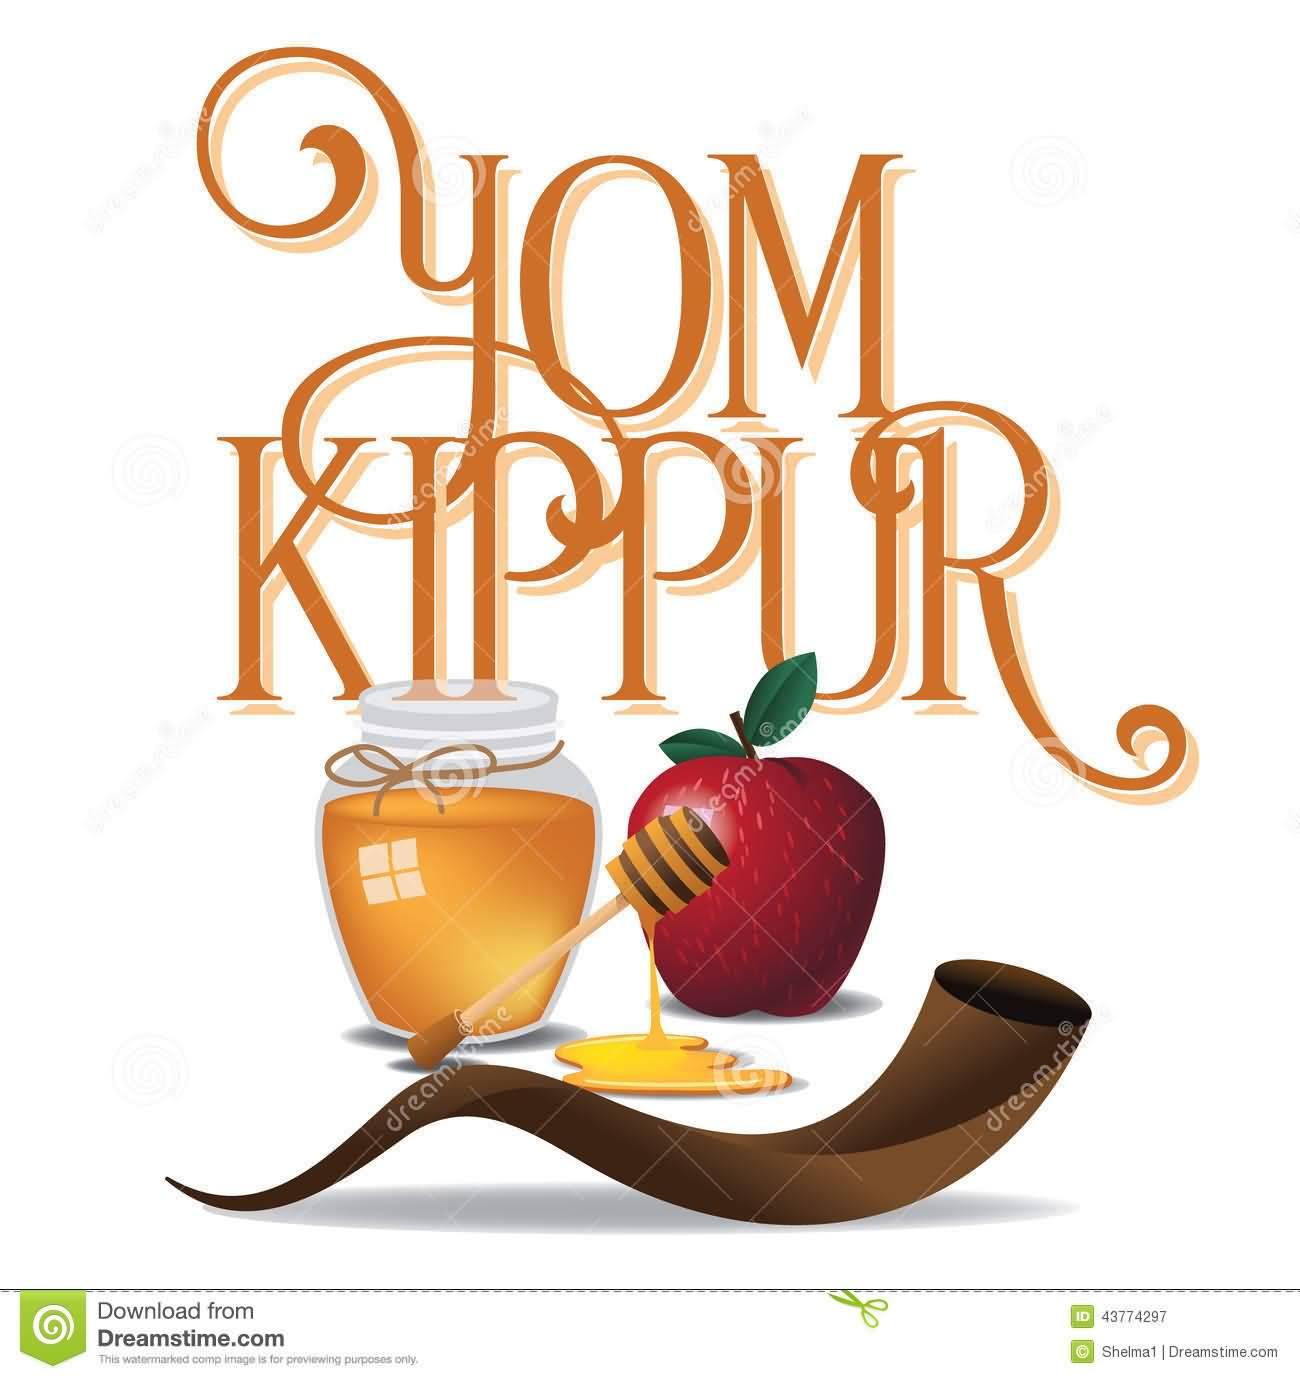 Yom kippur 2019 date in Sydney